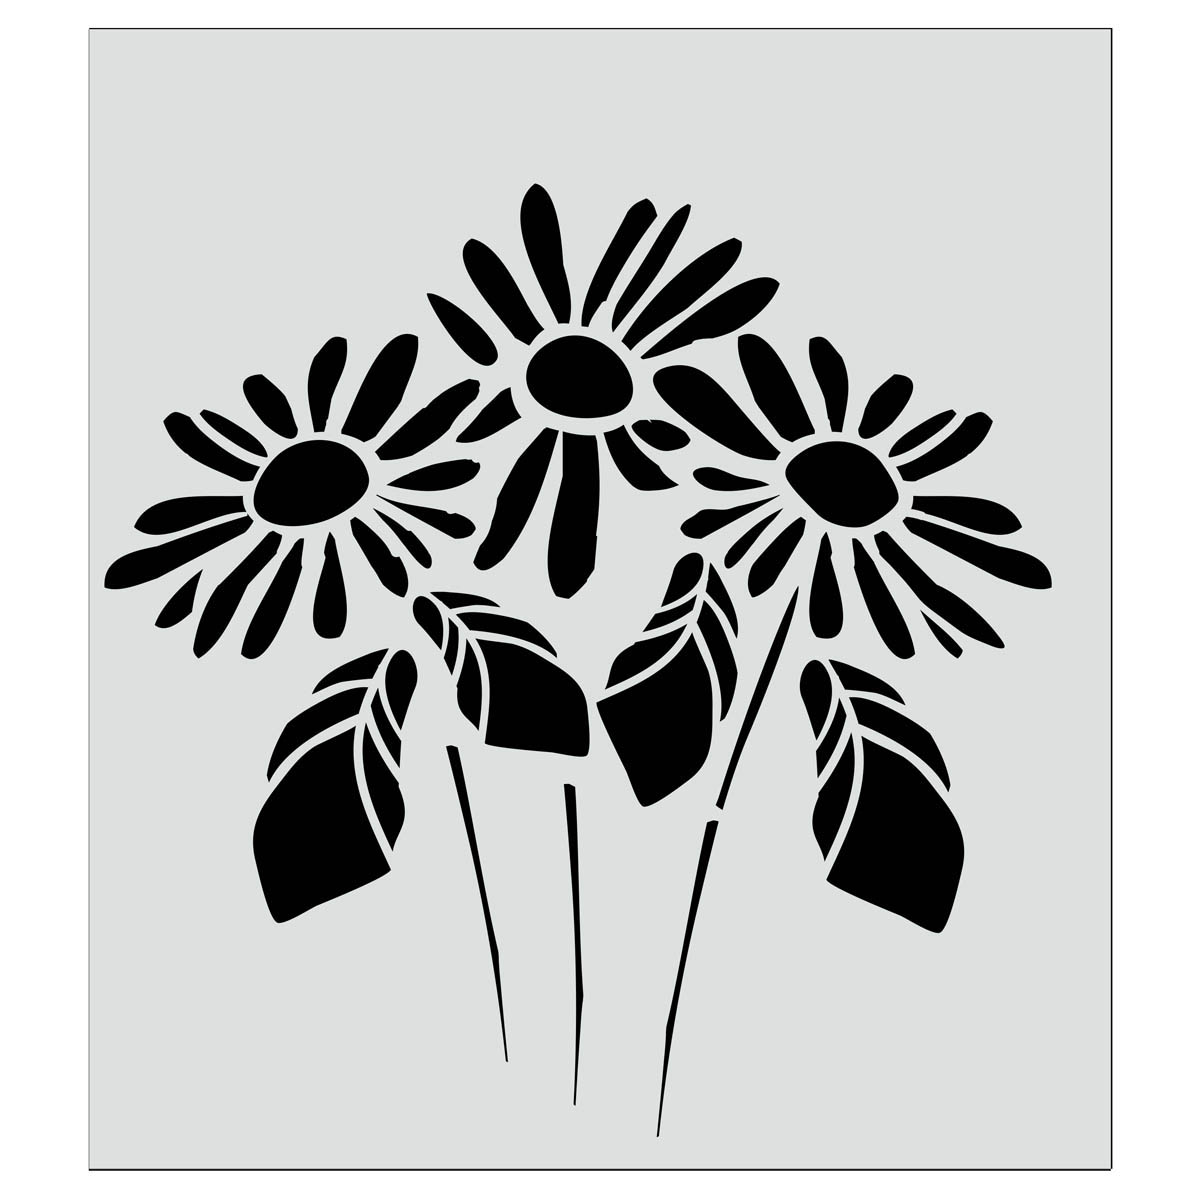 FolkArt ® Painting Stencils - Large - Lazy Daisy - 30937